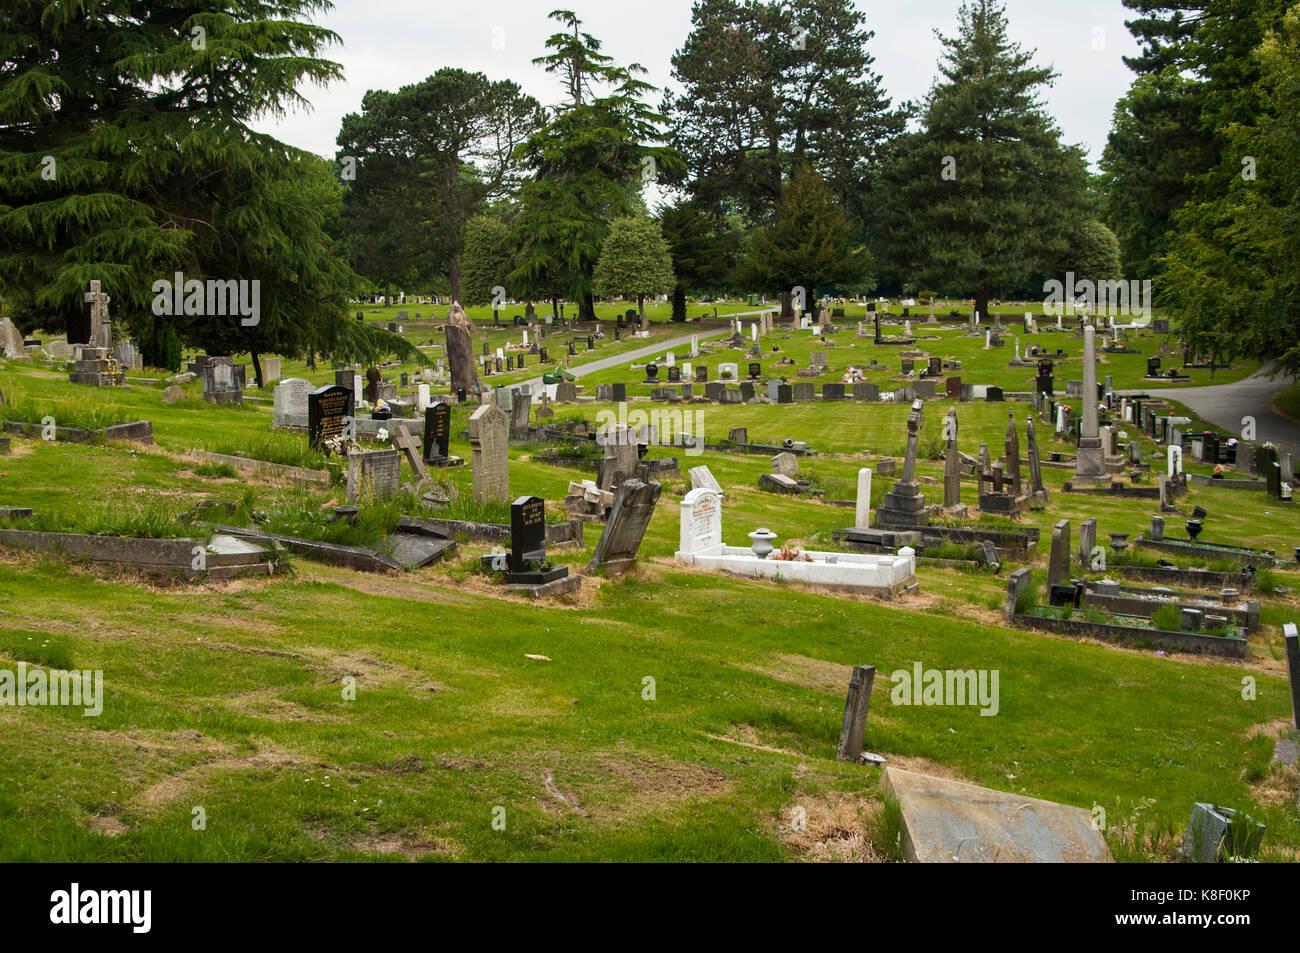 Macclesfield Cemetery, Cheshire, UK, England - Stock Image